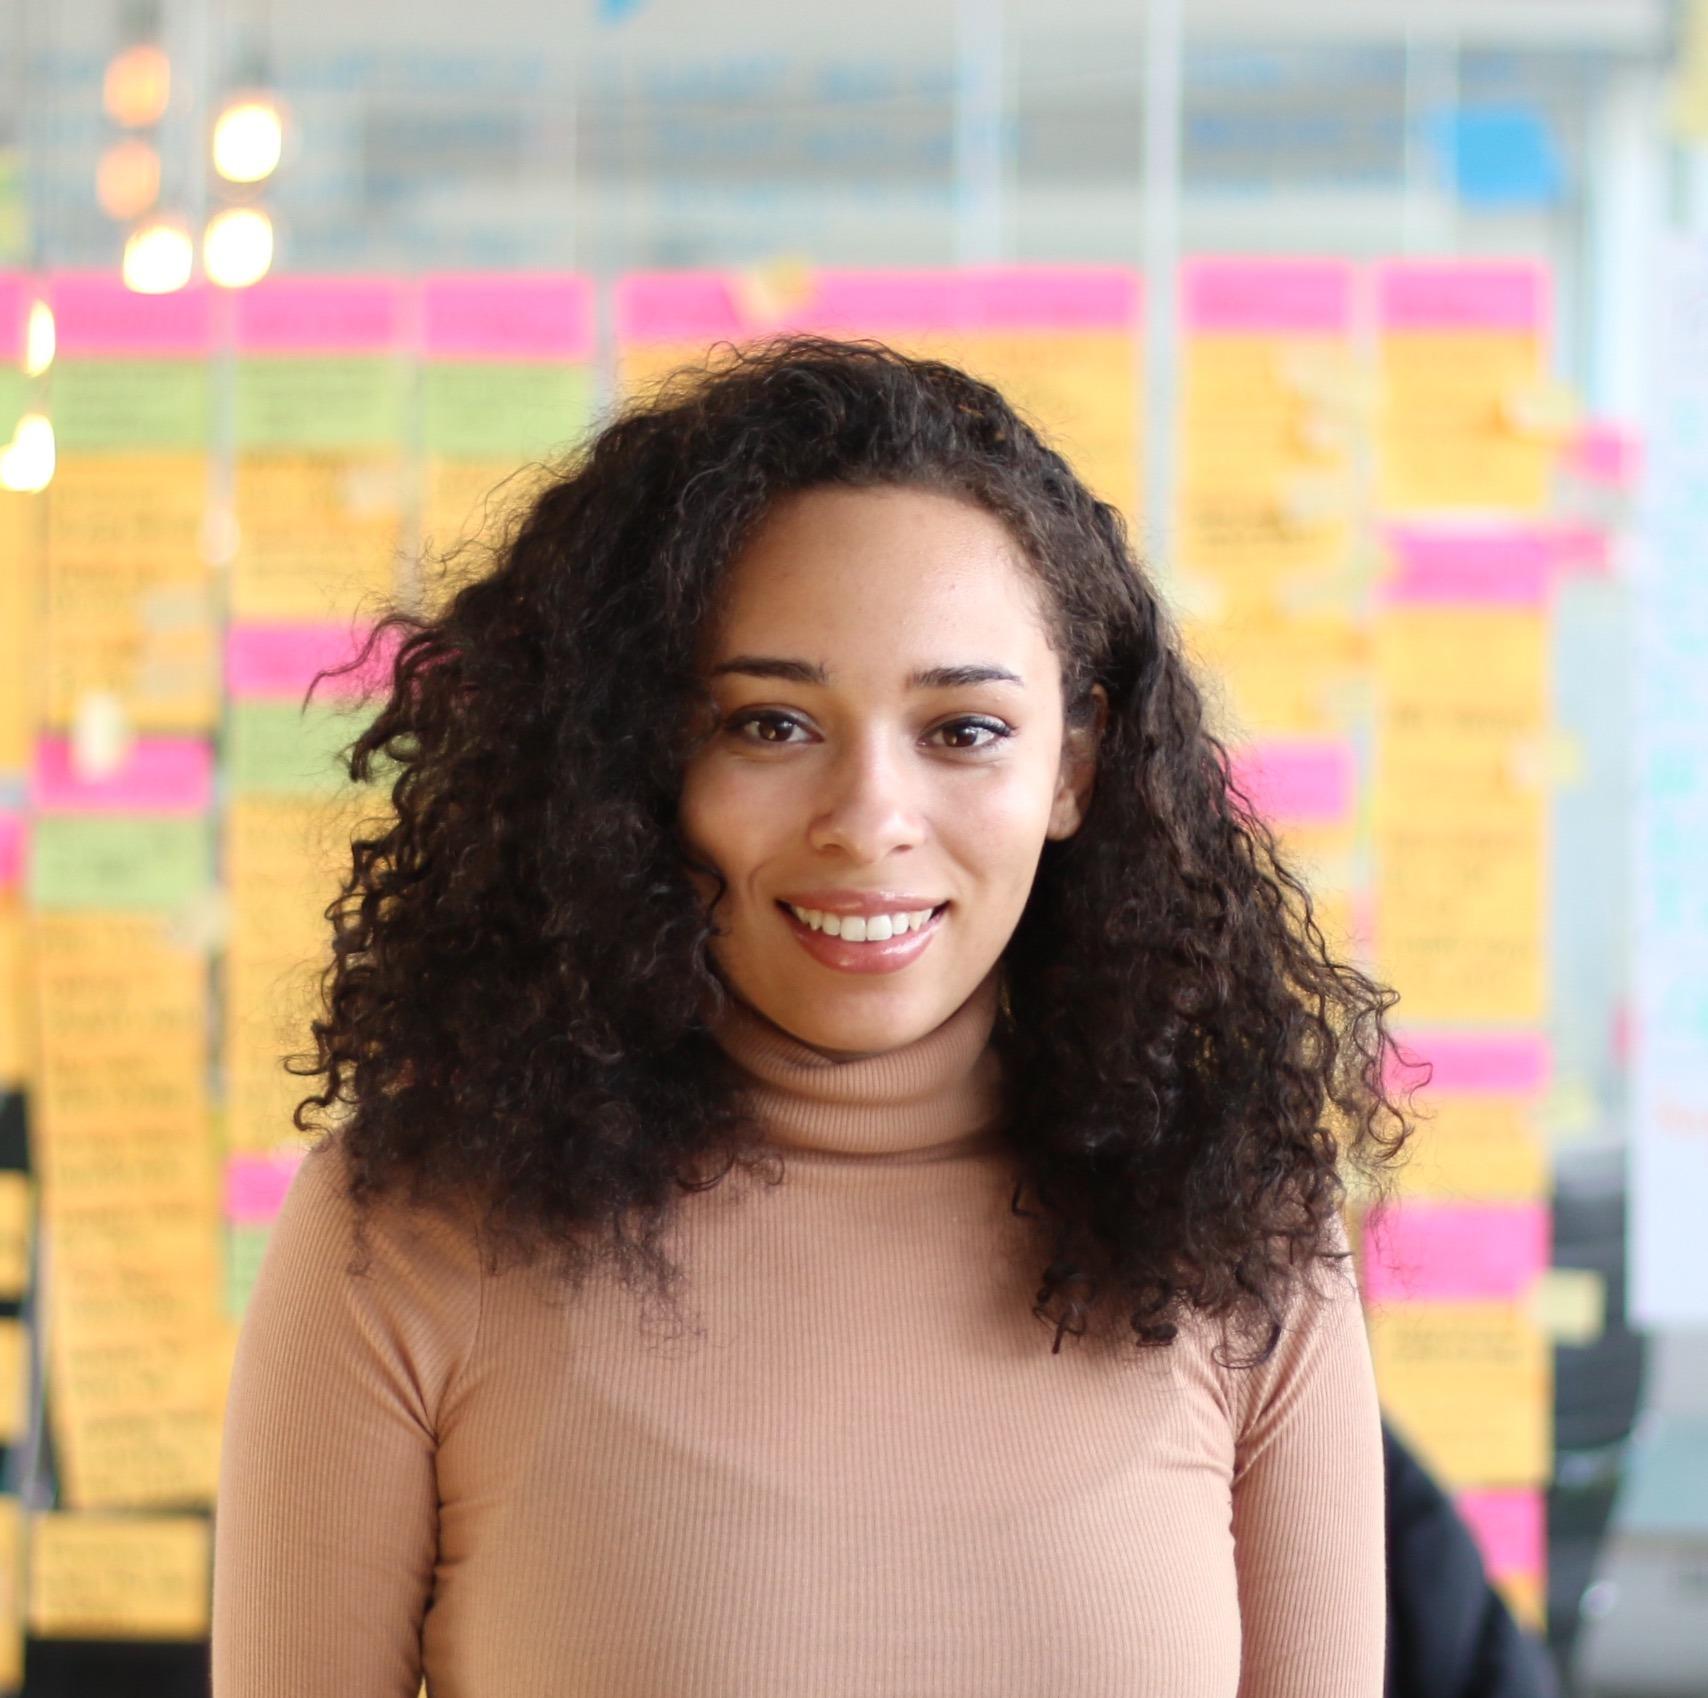 CareerFoundry Marketing Content Editor Jaye Hannah